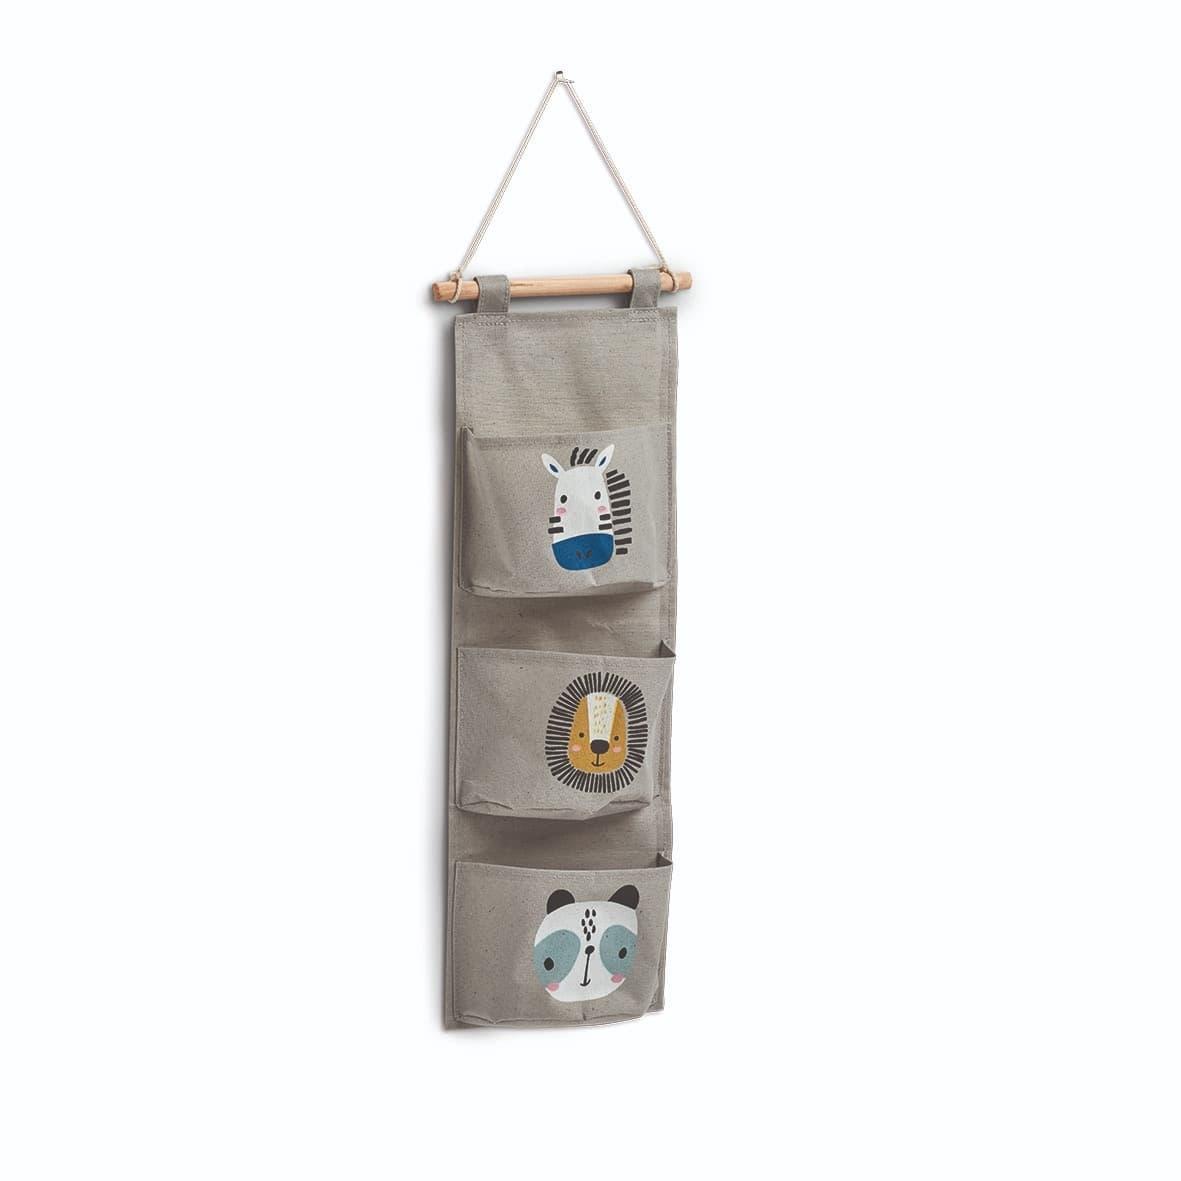 Organizator textil de perete pentru copii, cu 3 compartimente, Animals Tall Gri, l35xH81,5 cm